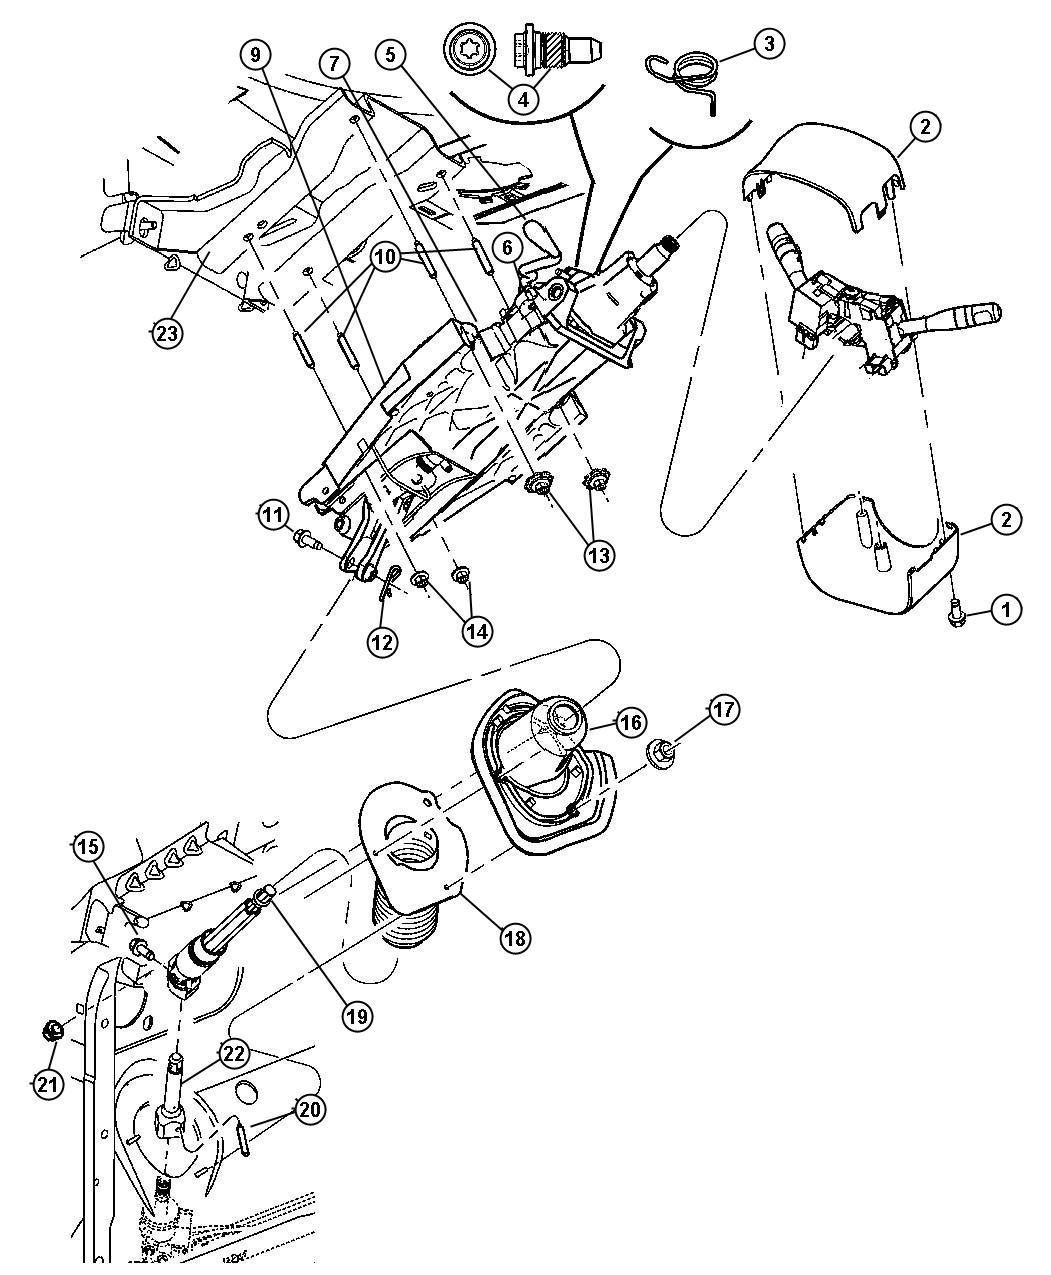 Chrysler Pacifica Shaft. Intermediate, steering column